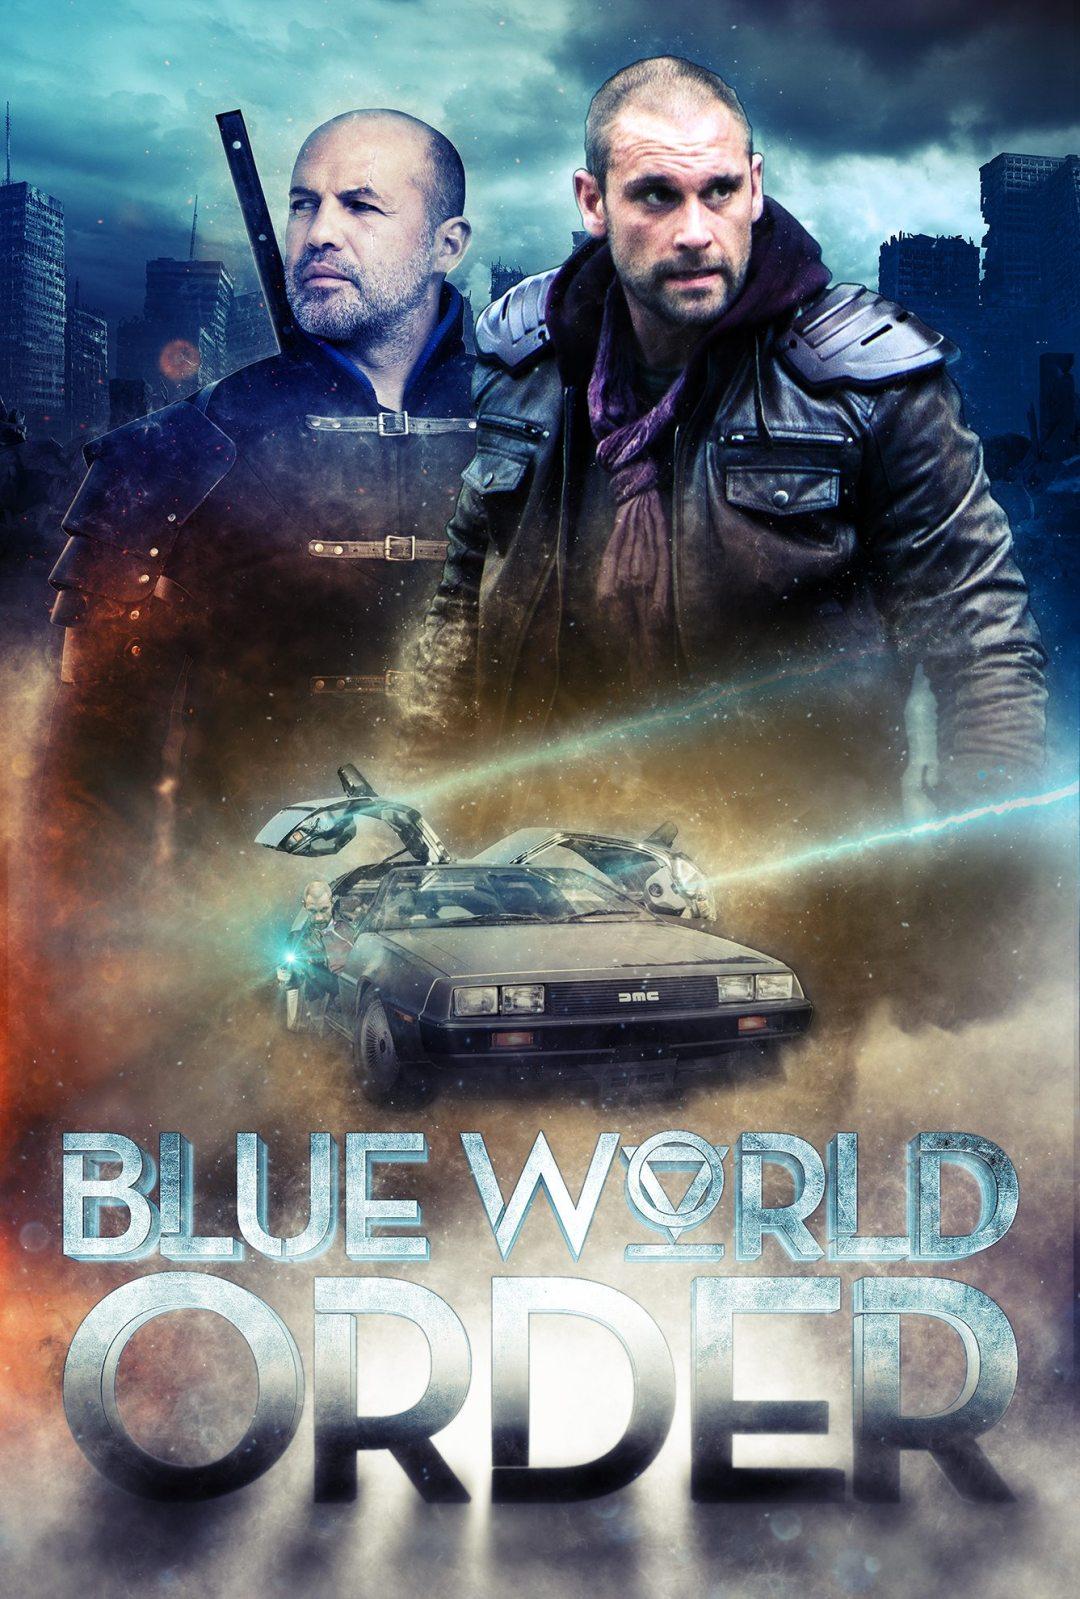 Random Media Heralds in a 'Blue World Order' on VOD January 16th